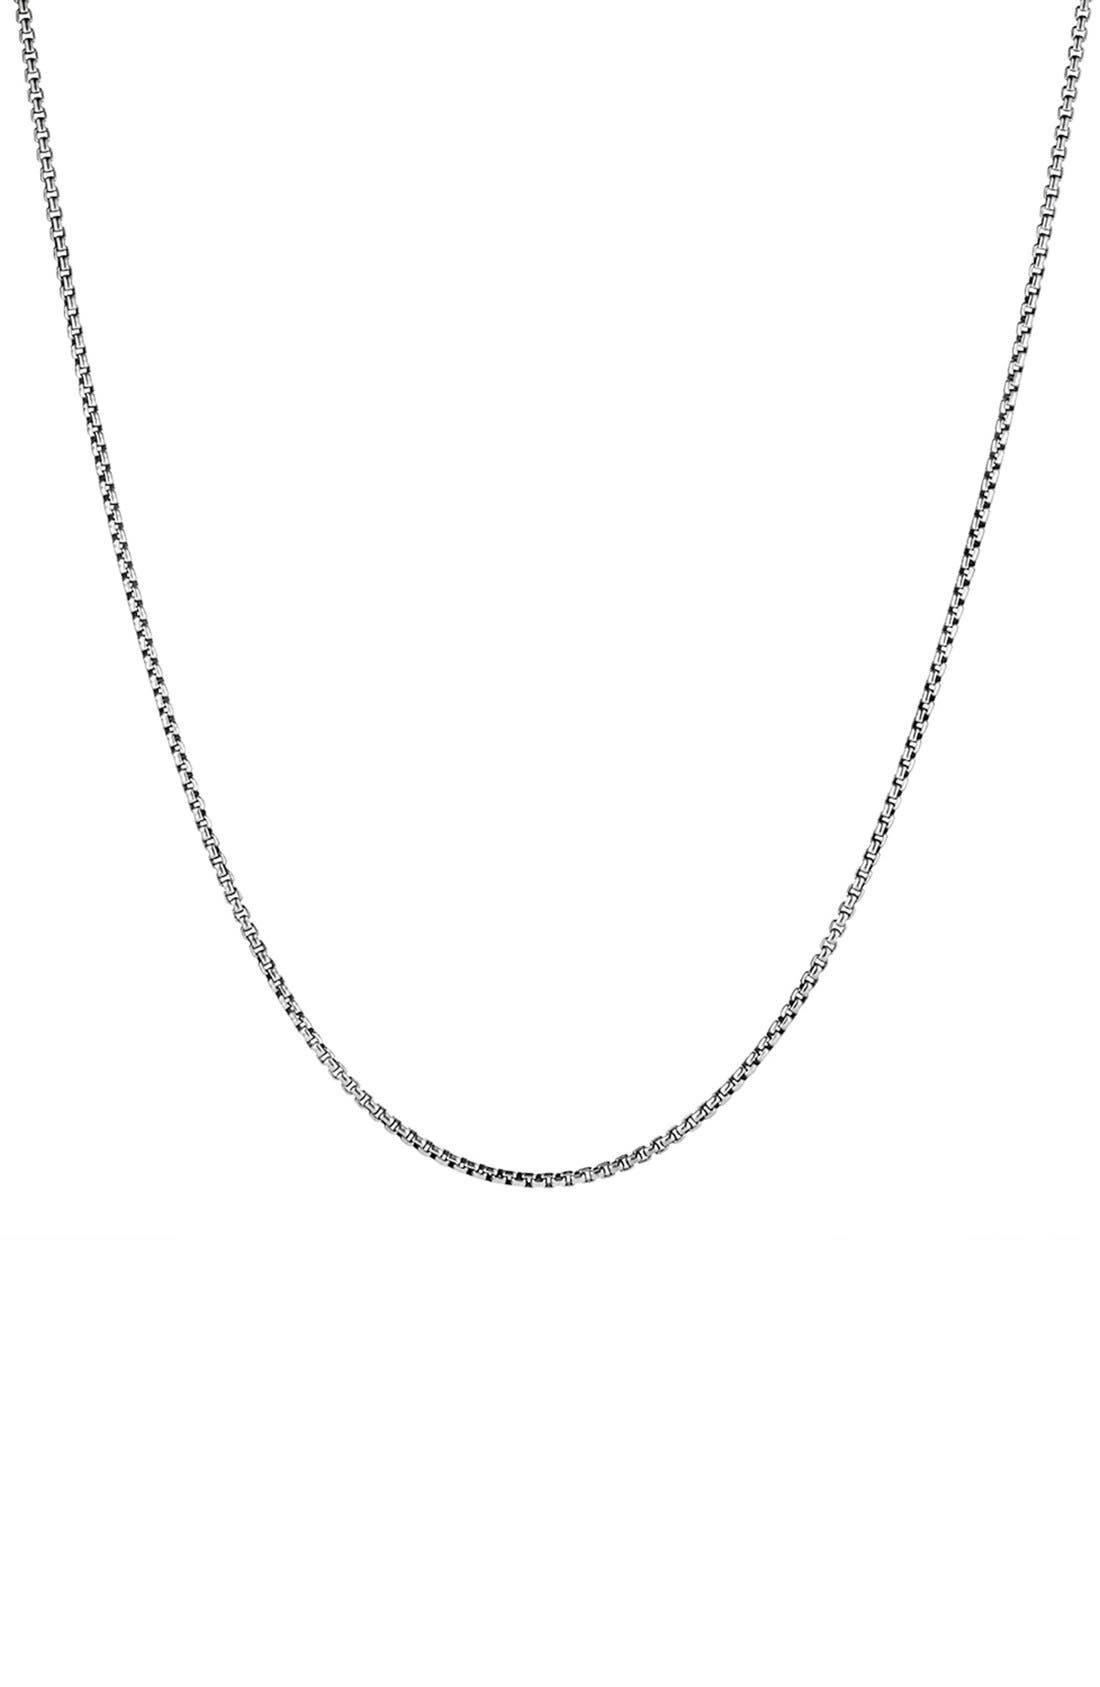 Alternate Image 1 Selected - David Yurman 'Chain' Necklace